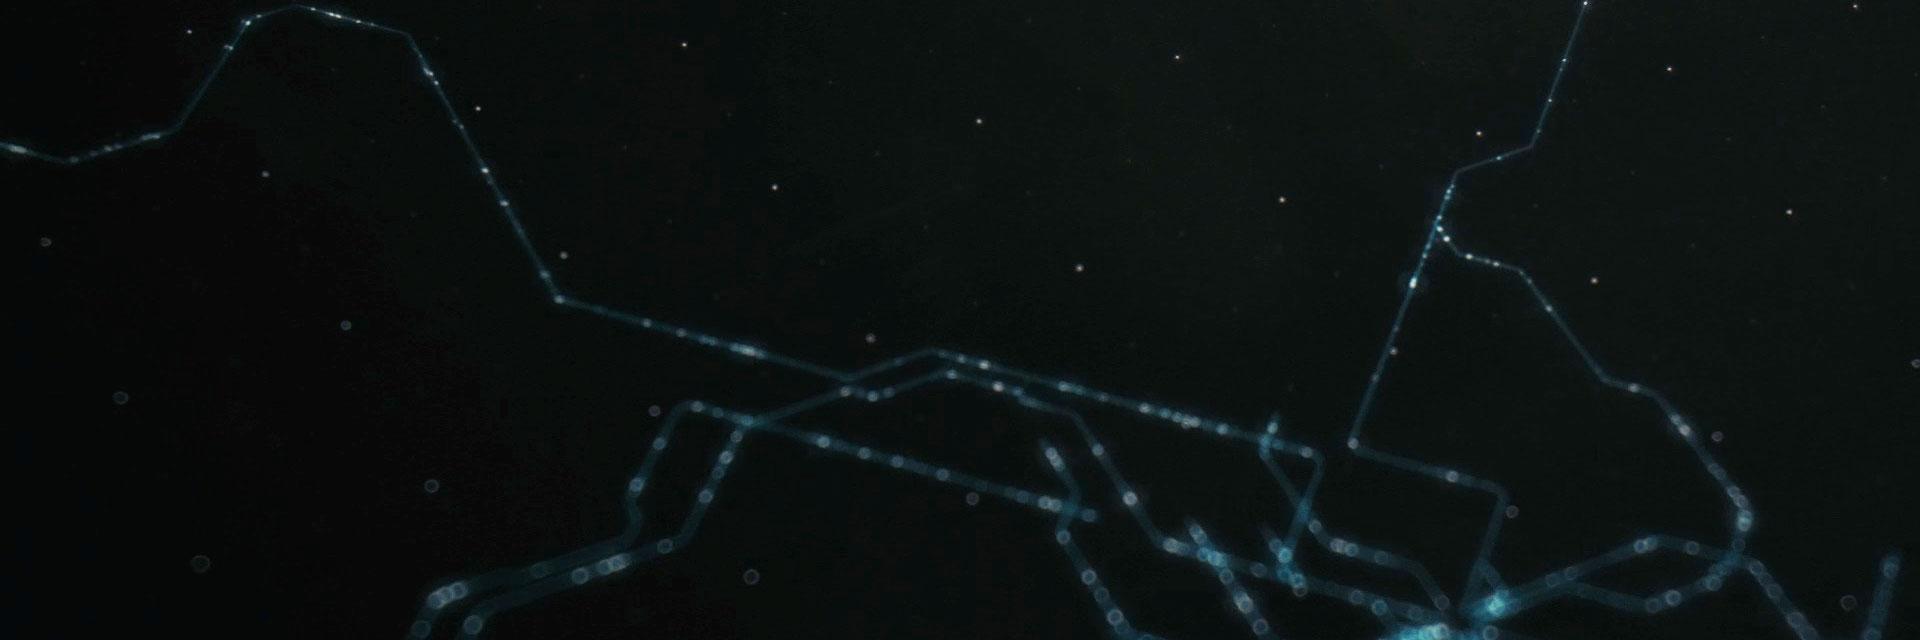 Techno Explorations